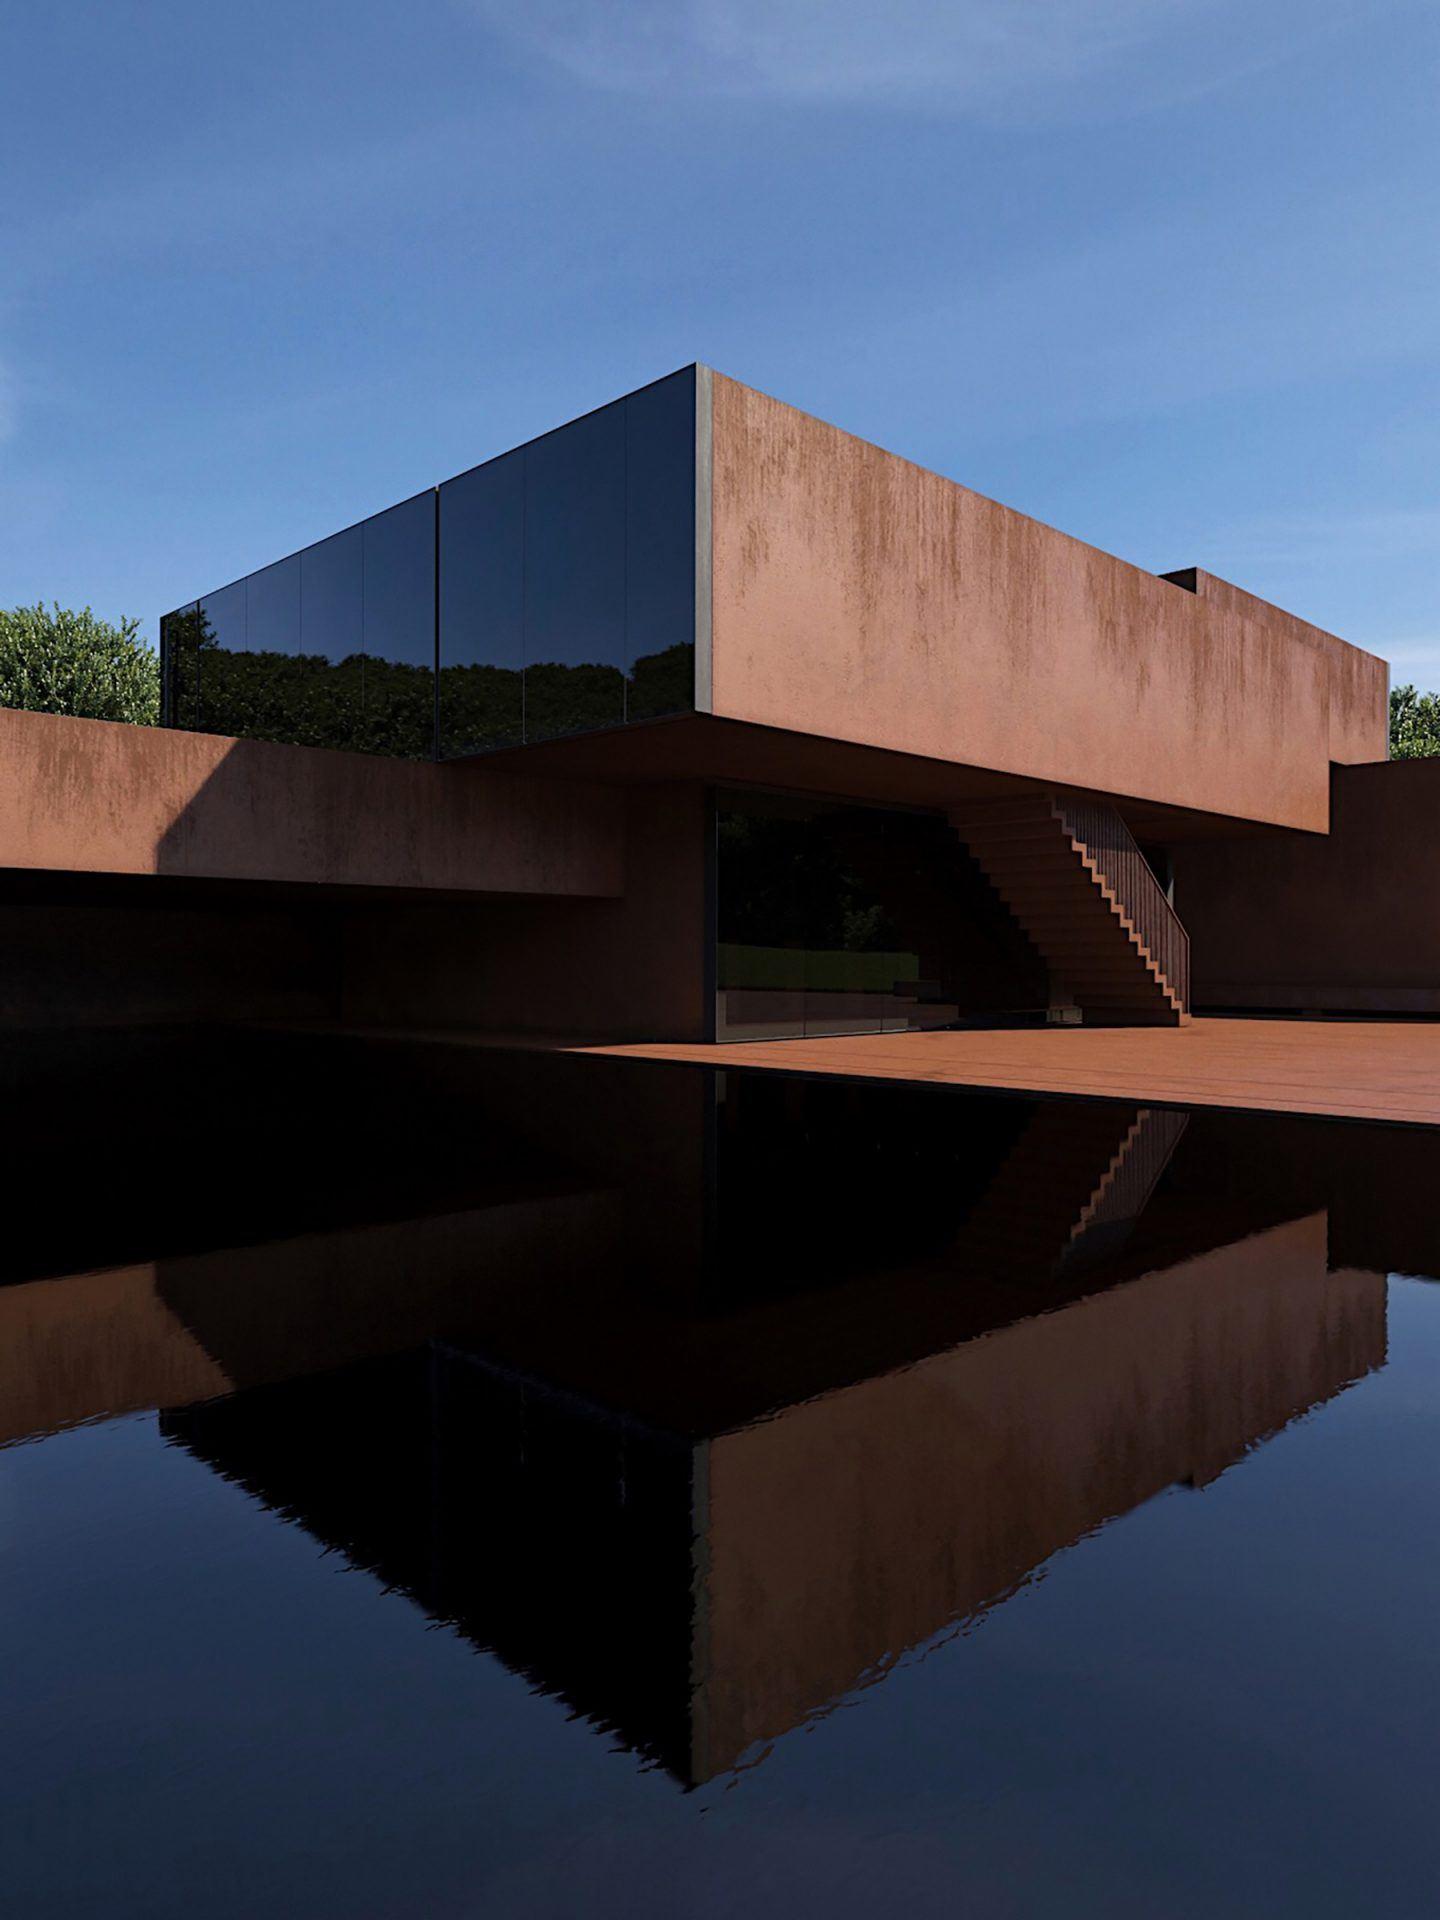 IGNANT-Architecture-SPRW-Architects-Flatness-10